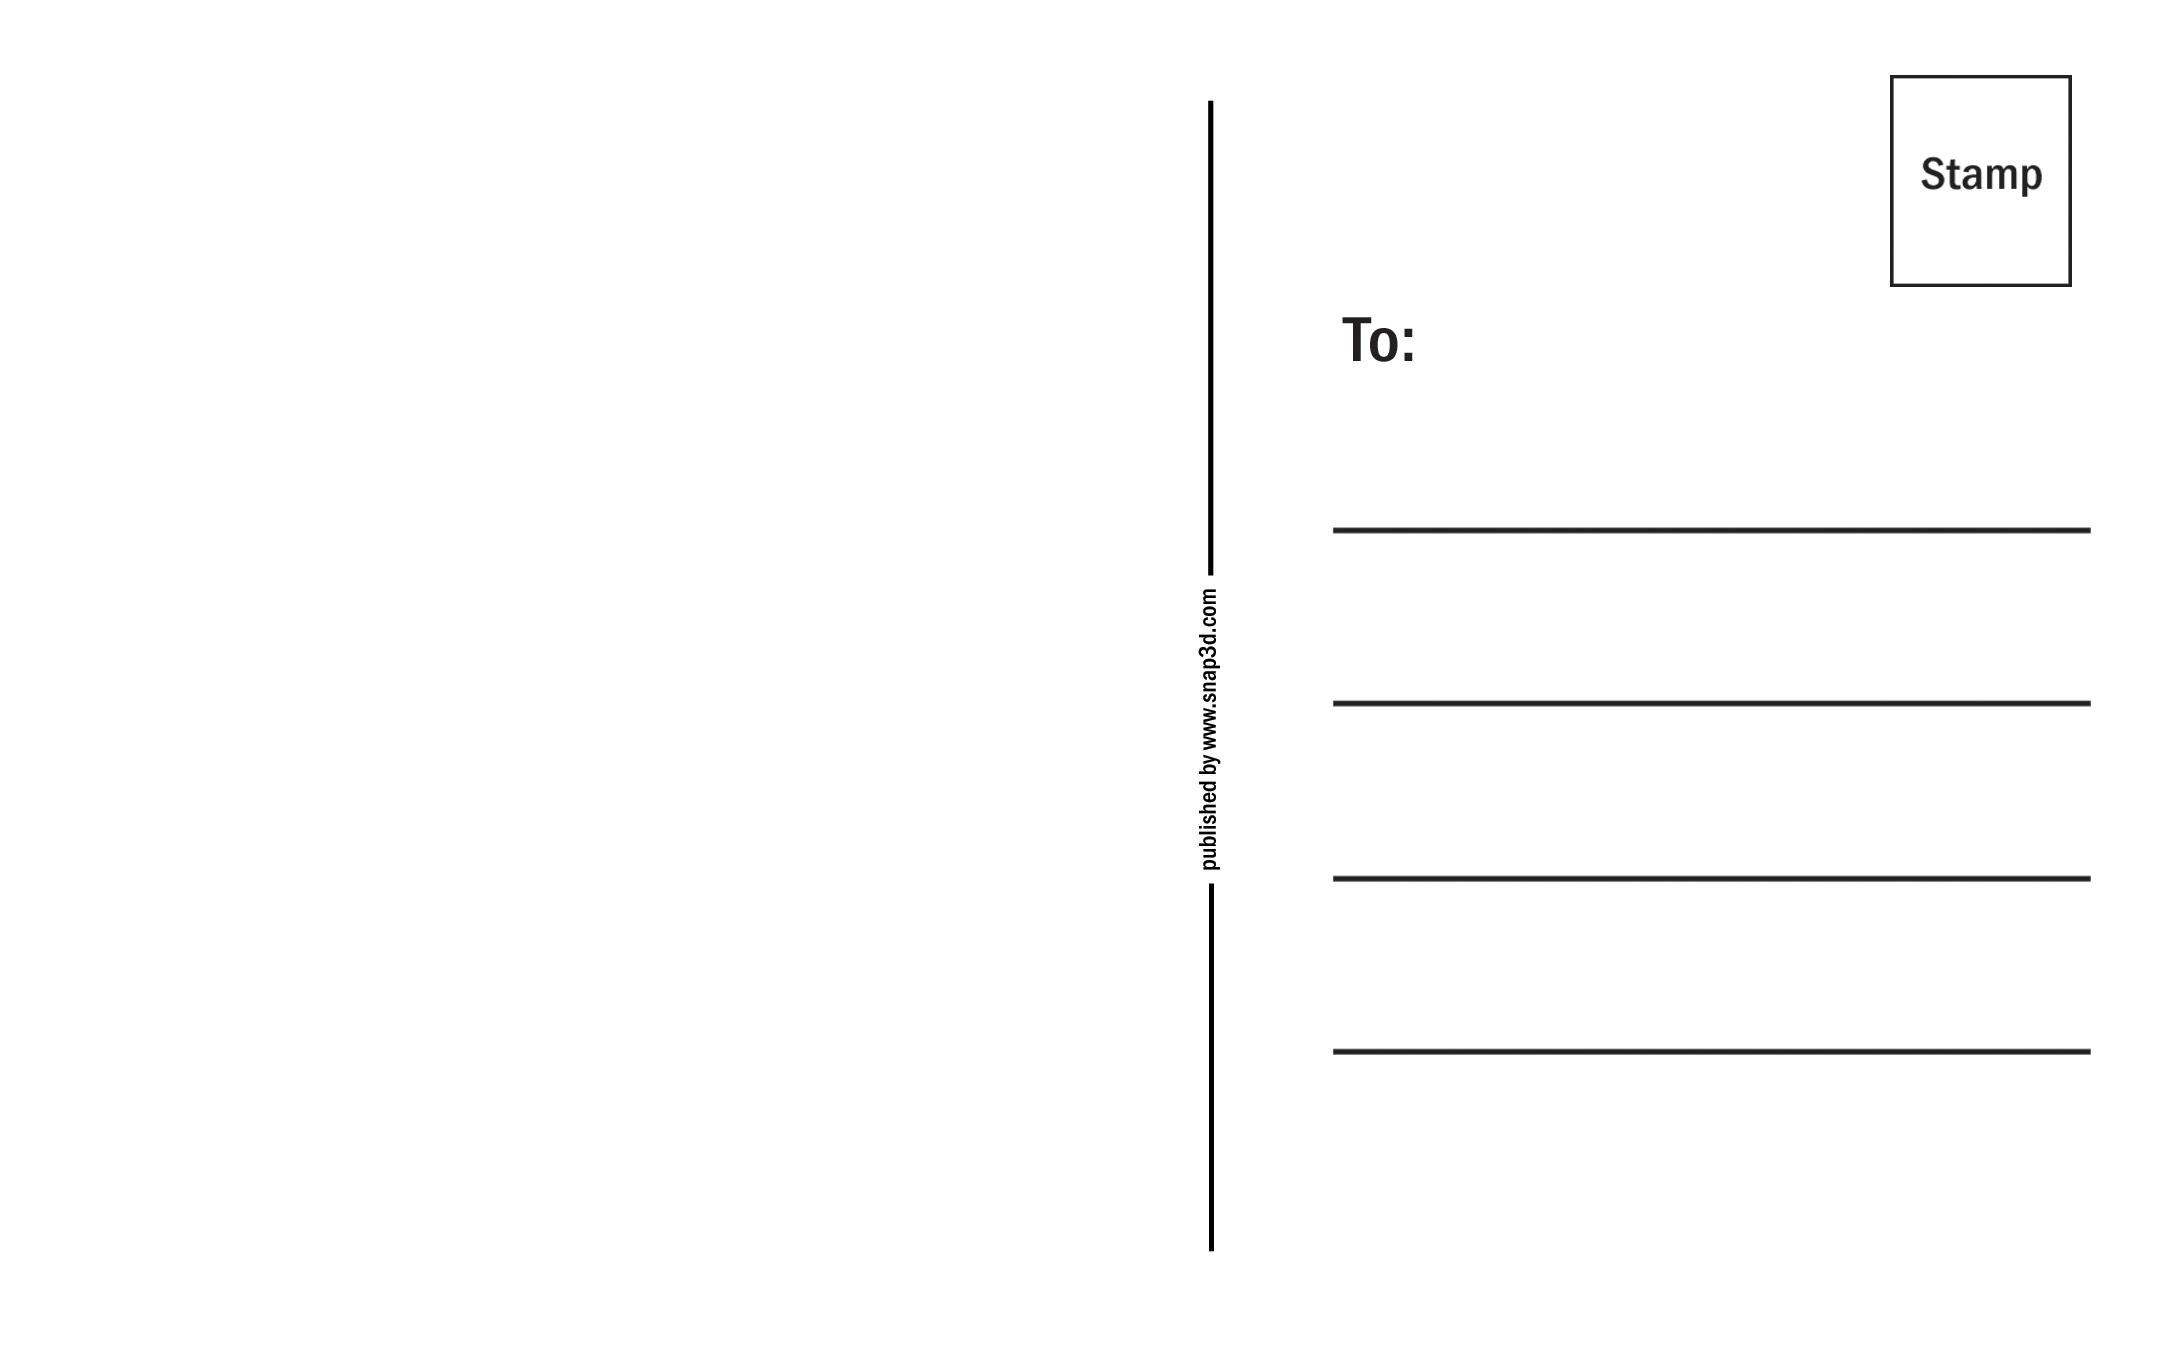 4x6 Postcard Template Word | Sample CV Resume